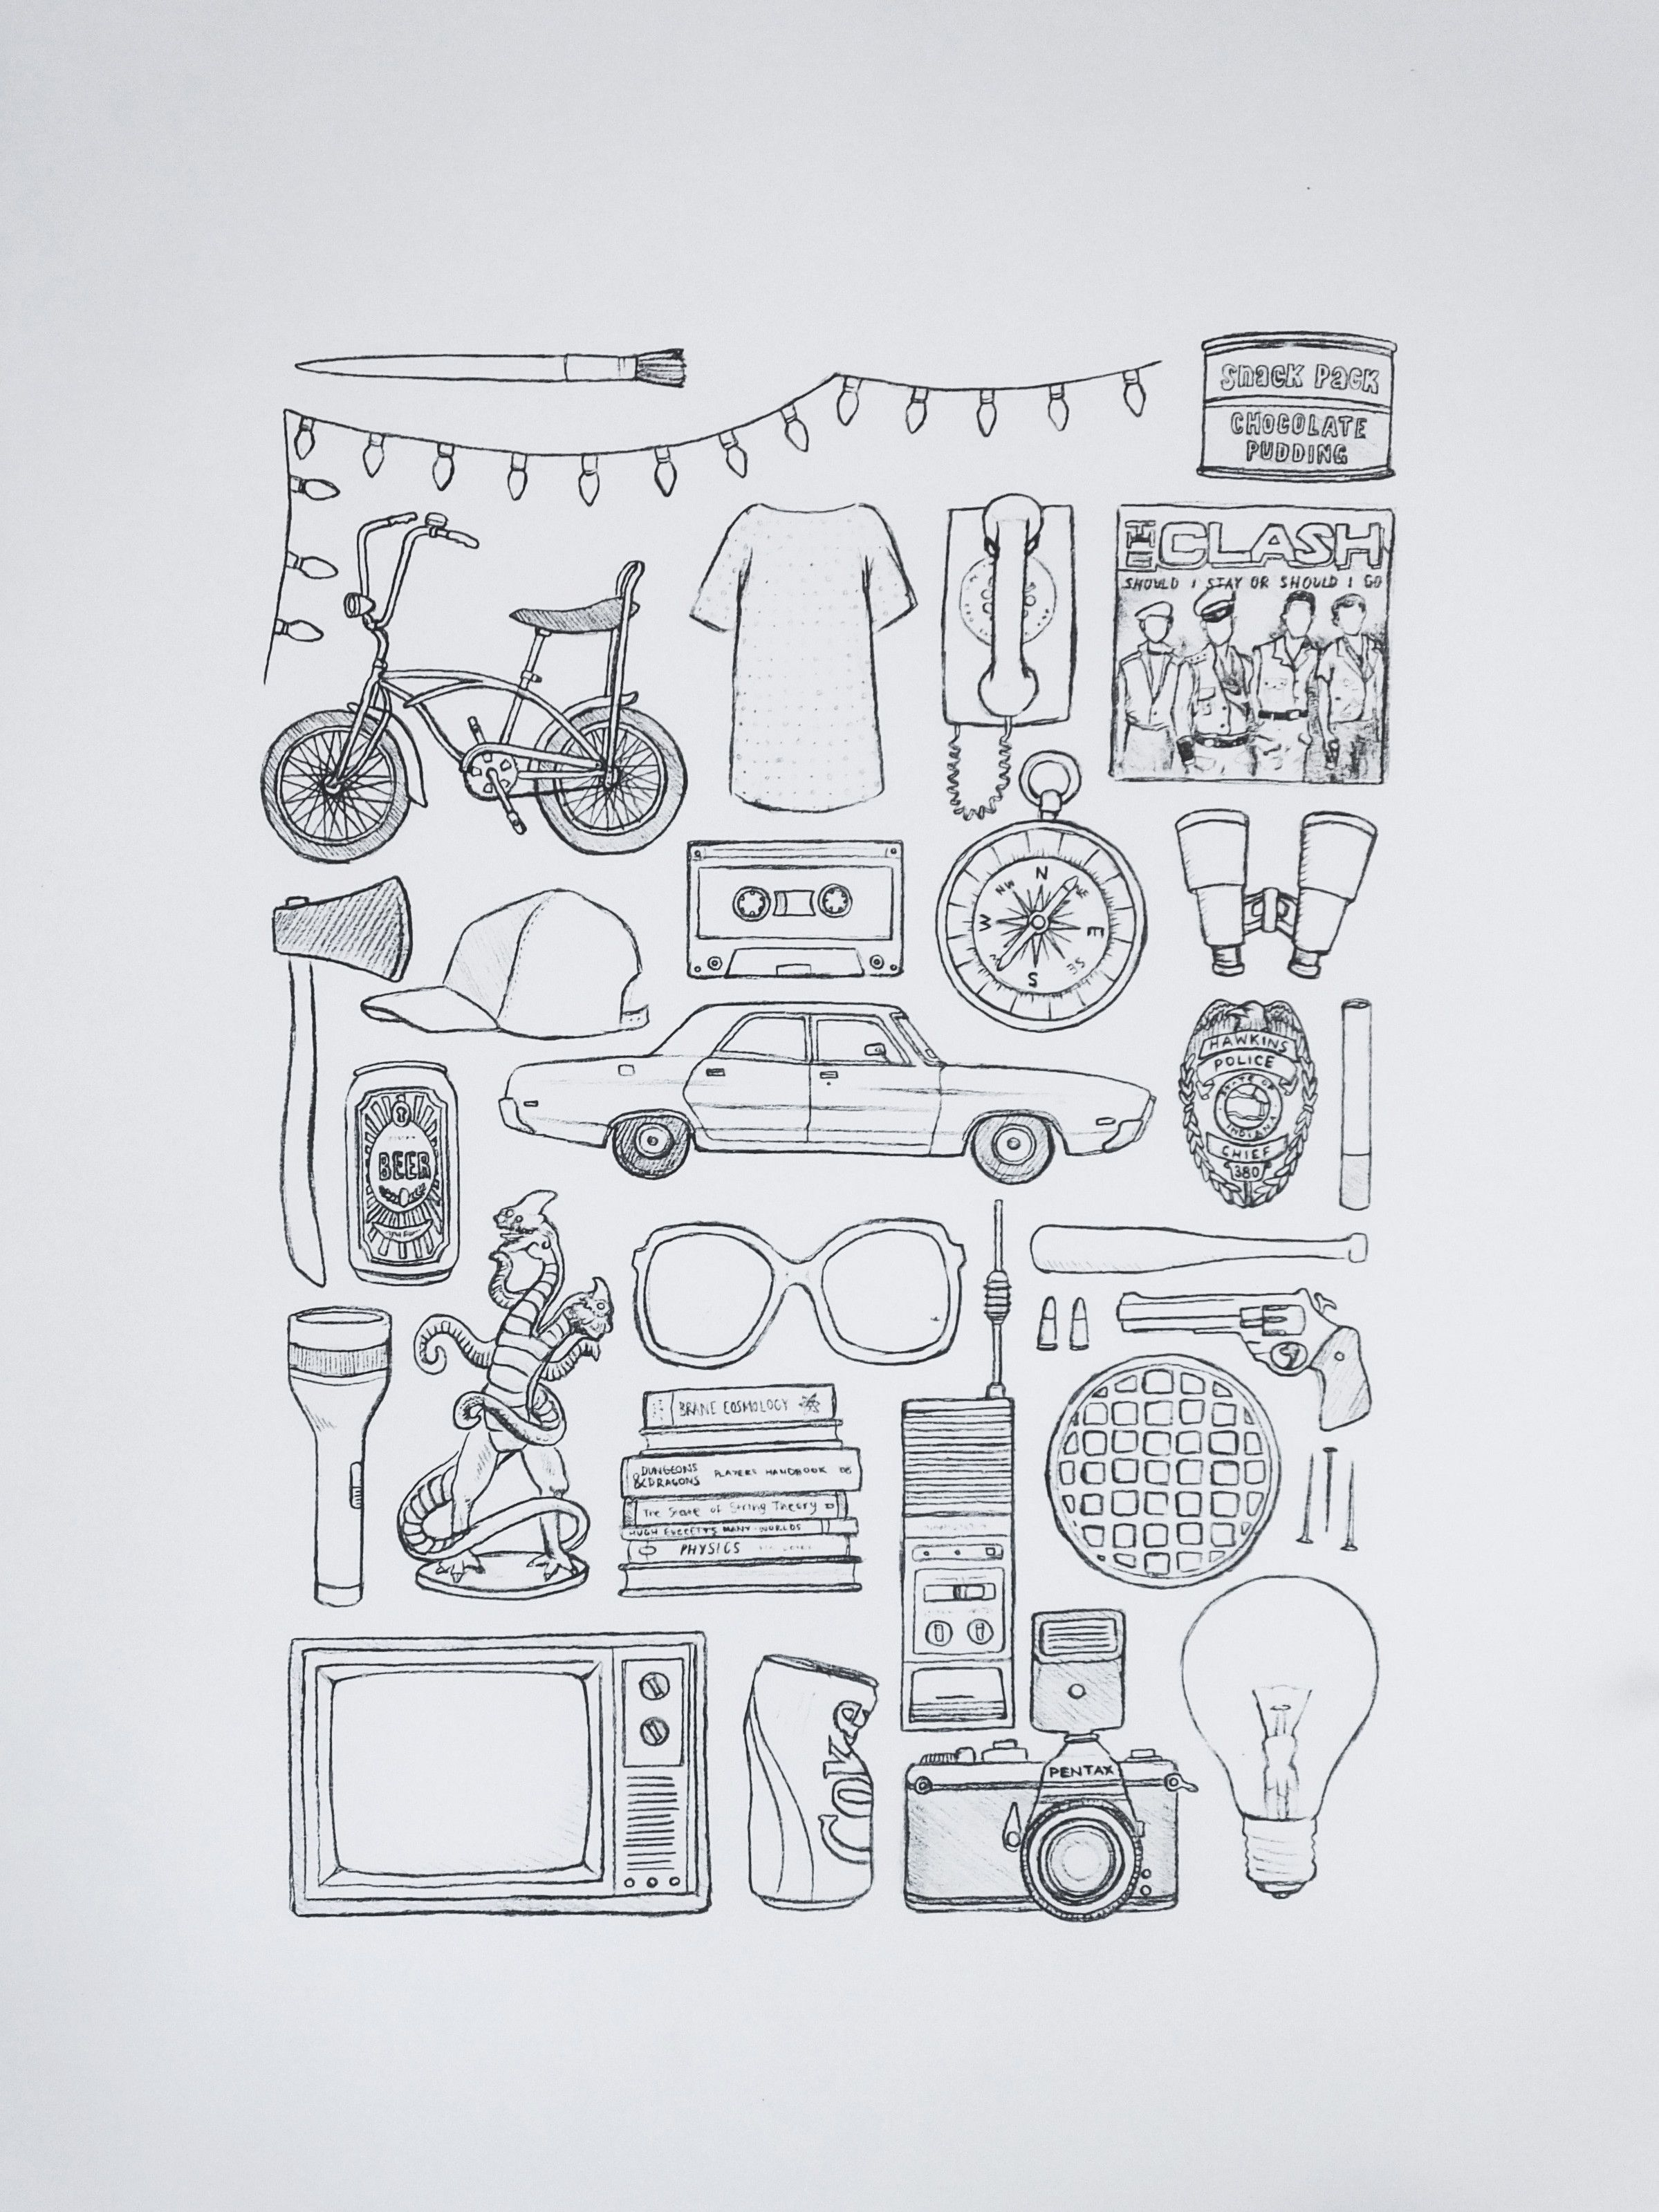 Stranger Things Print Available At Art Design Poster Movie Series Merch Art Print A3 A4 Car Imagenes Para Dibujar Faciles Dibujos Fáciles Imagenes De Dibujos